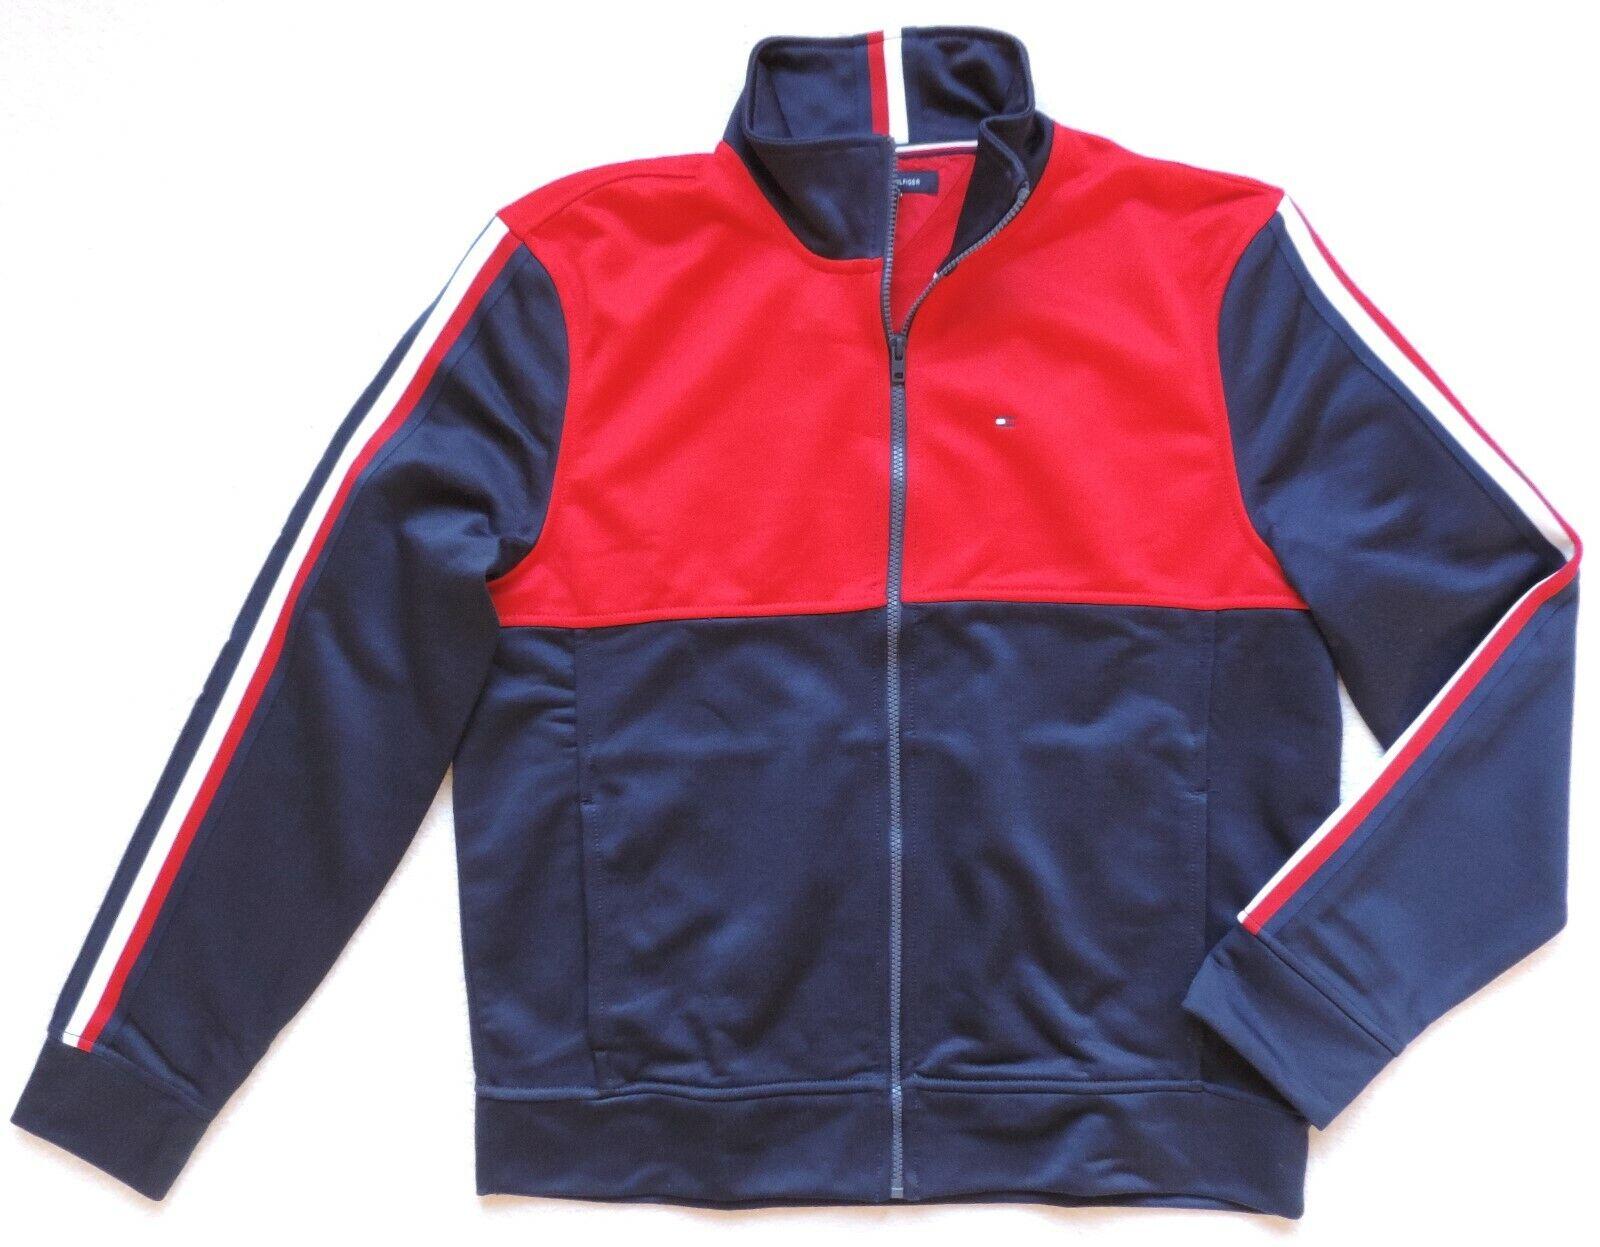 Tommy Hilfiger Herren Logo Reißverschluss Trainingsjacke, Marineblau/Rot